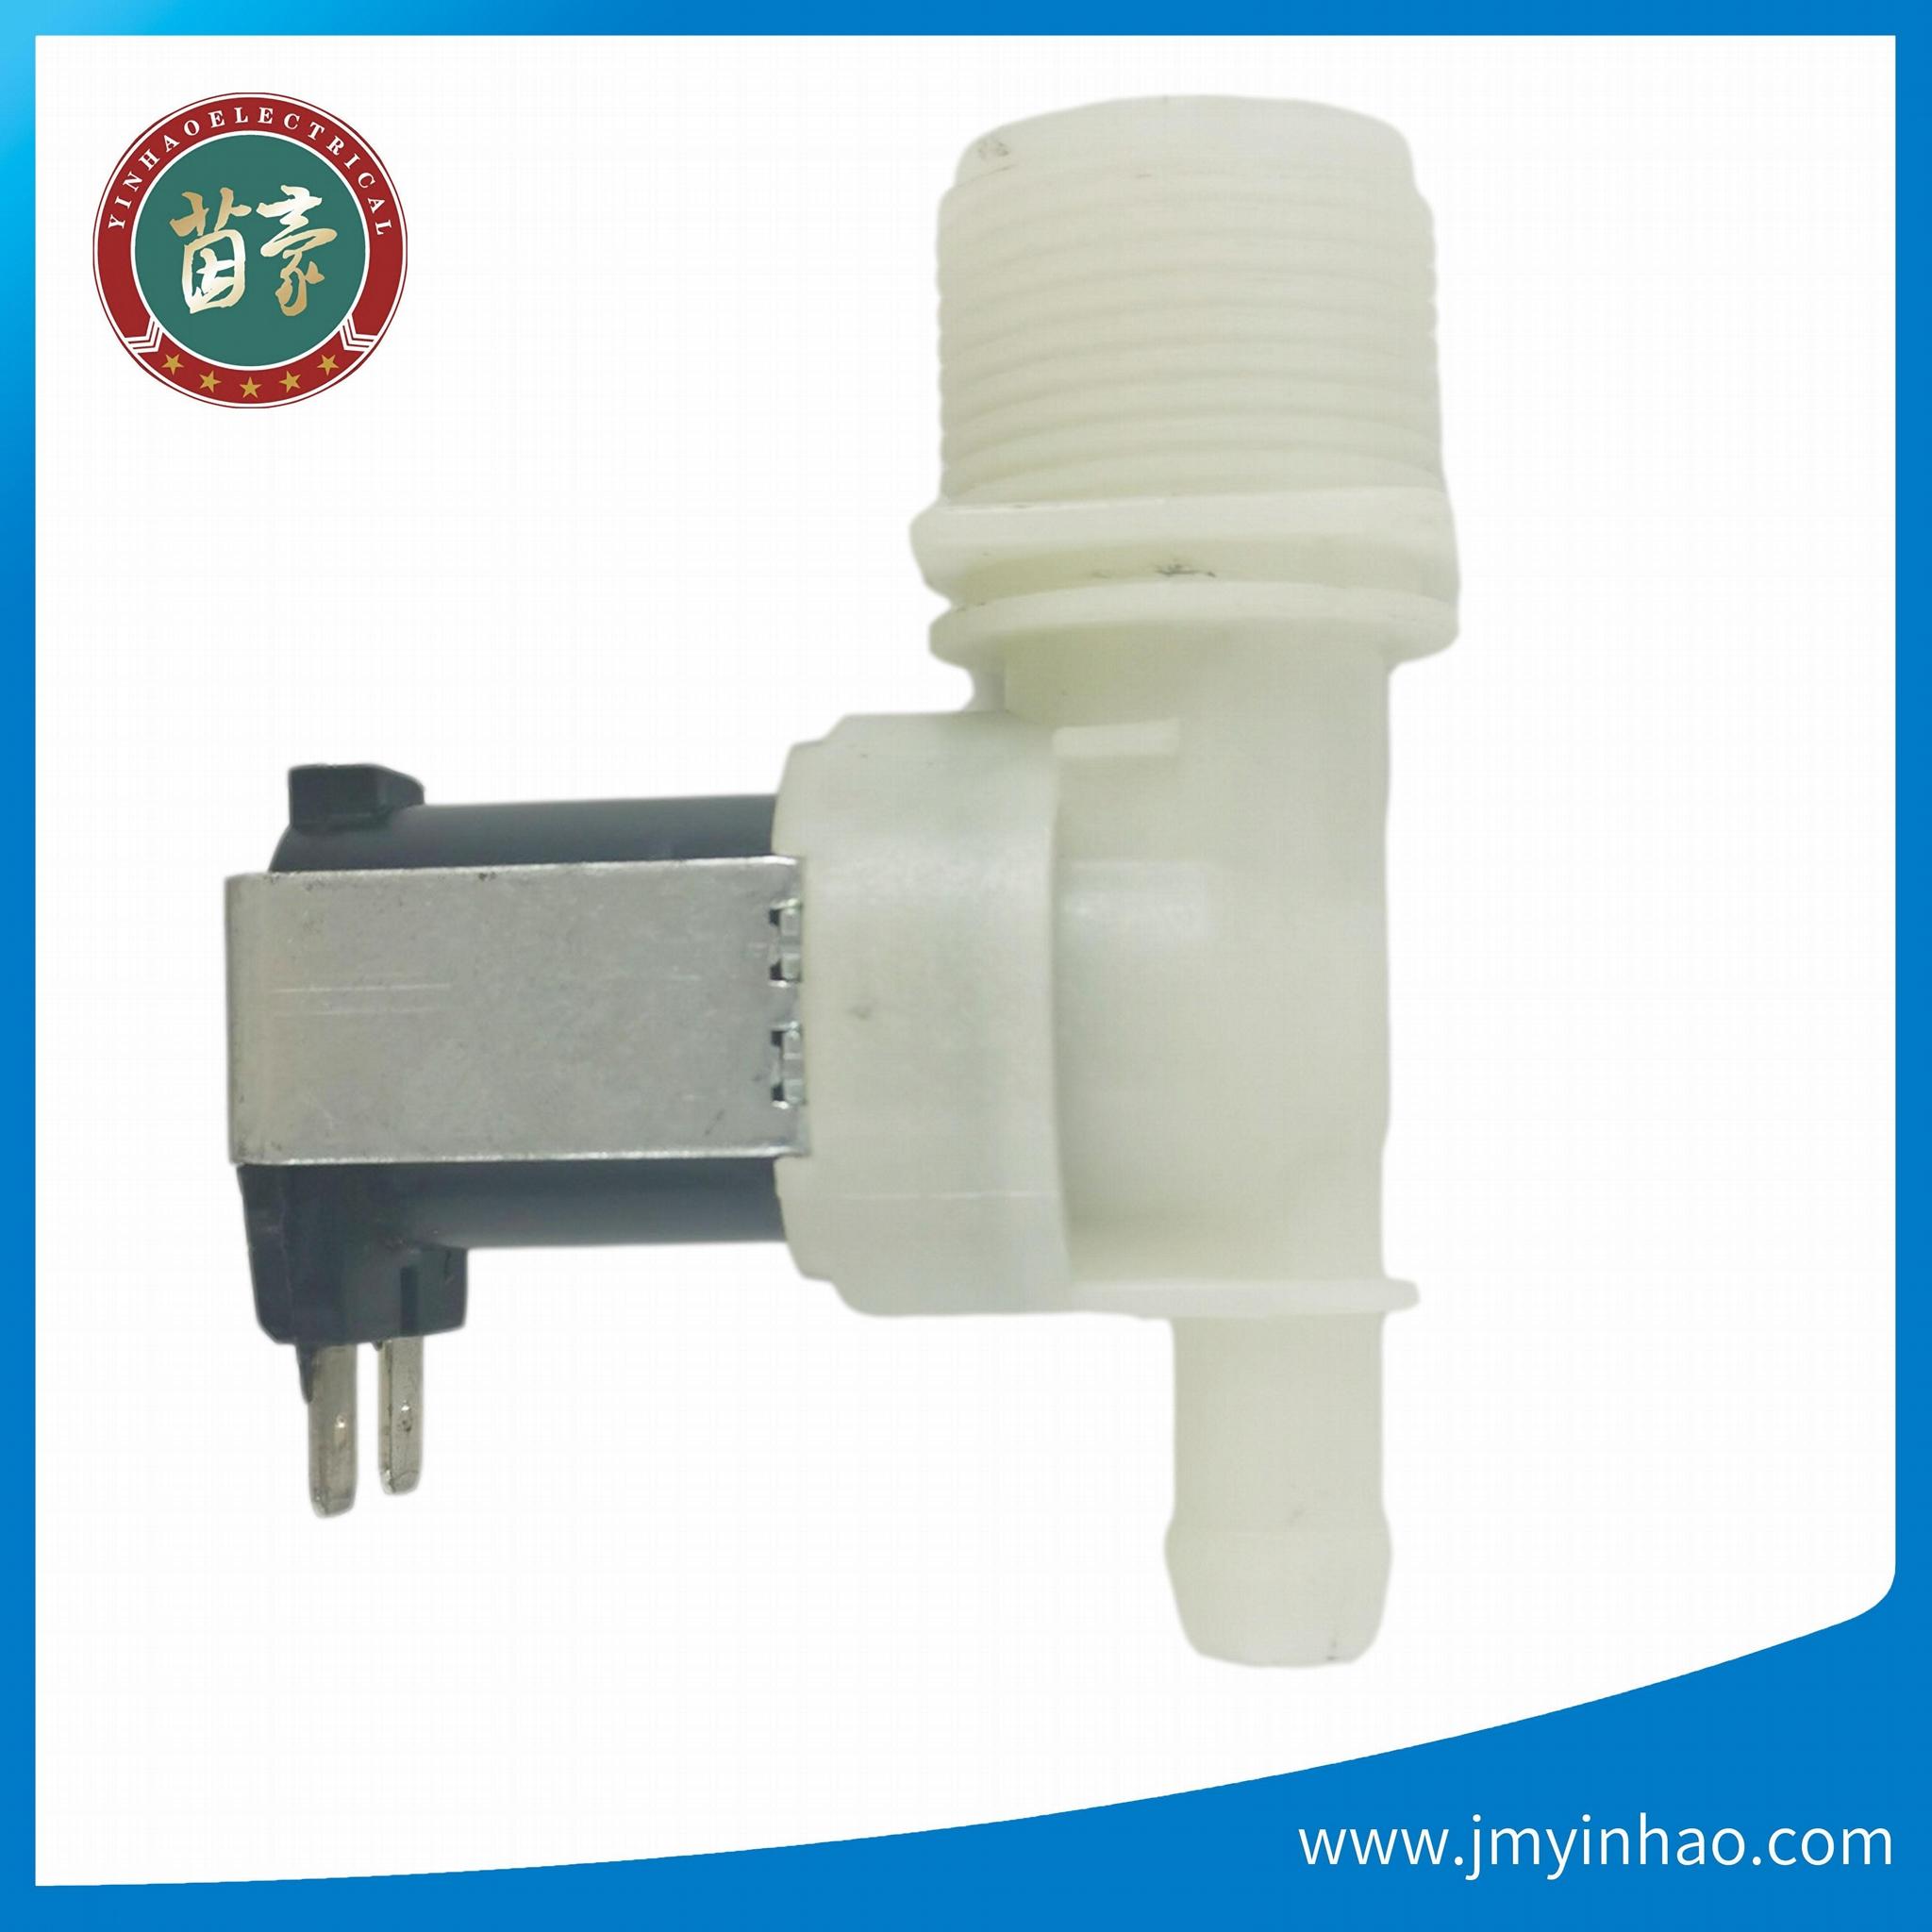 807445903 For Frigidaire Dishwasher Water Va  e